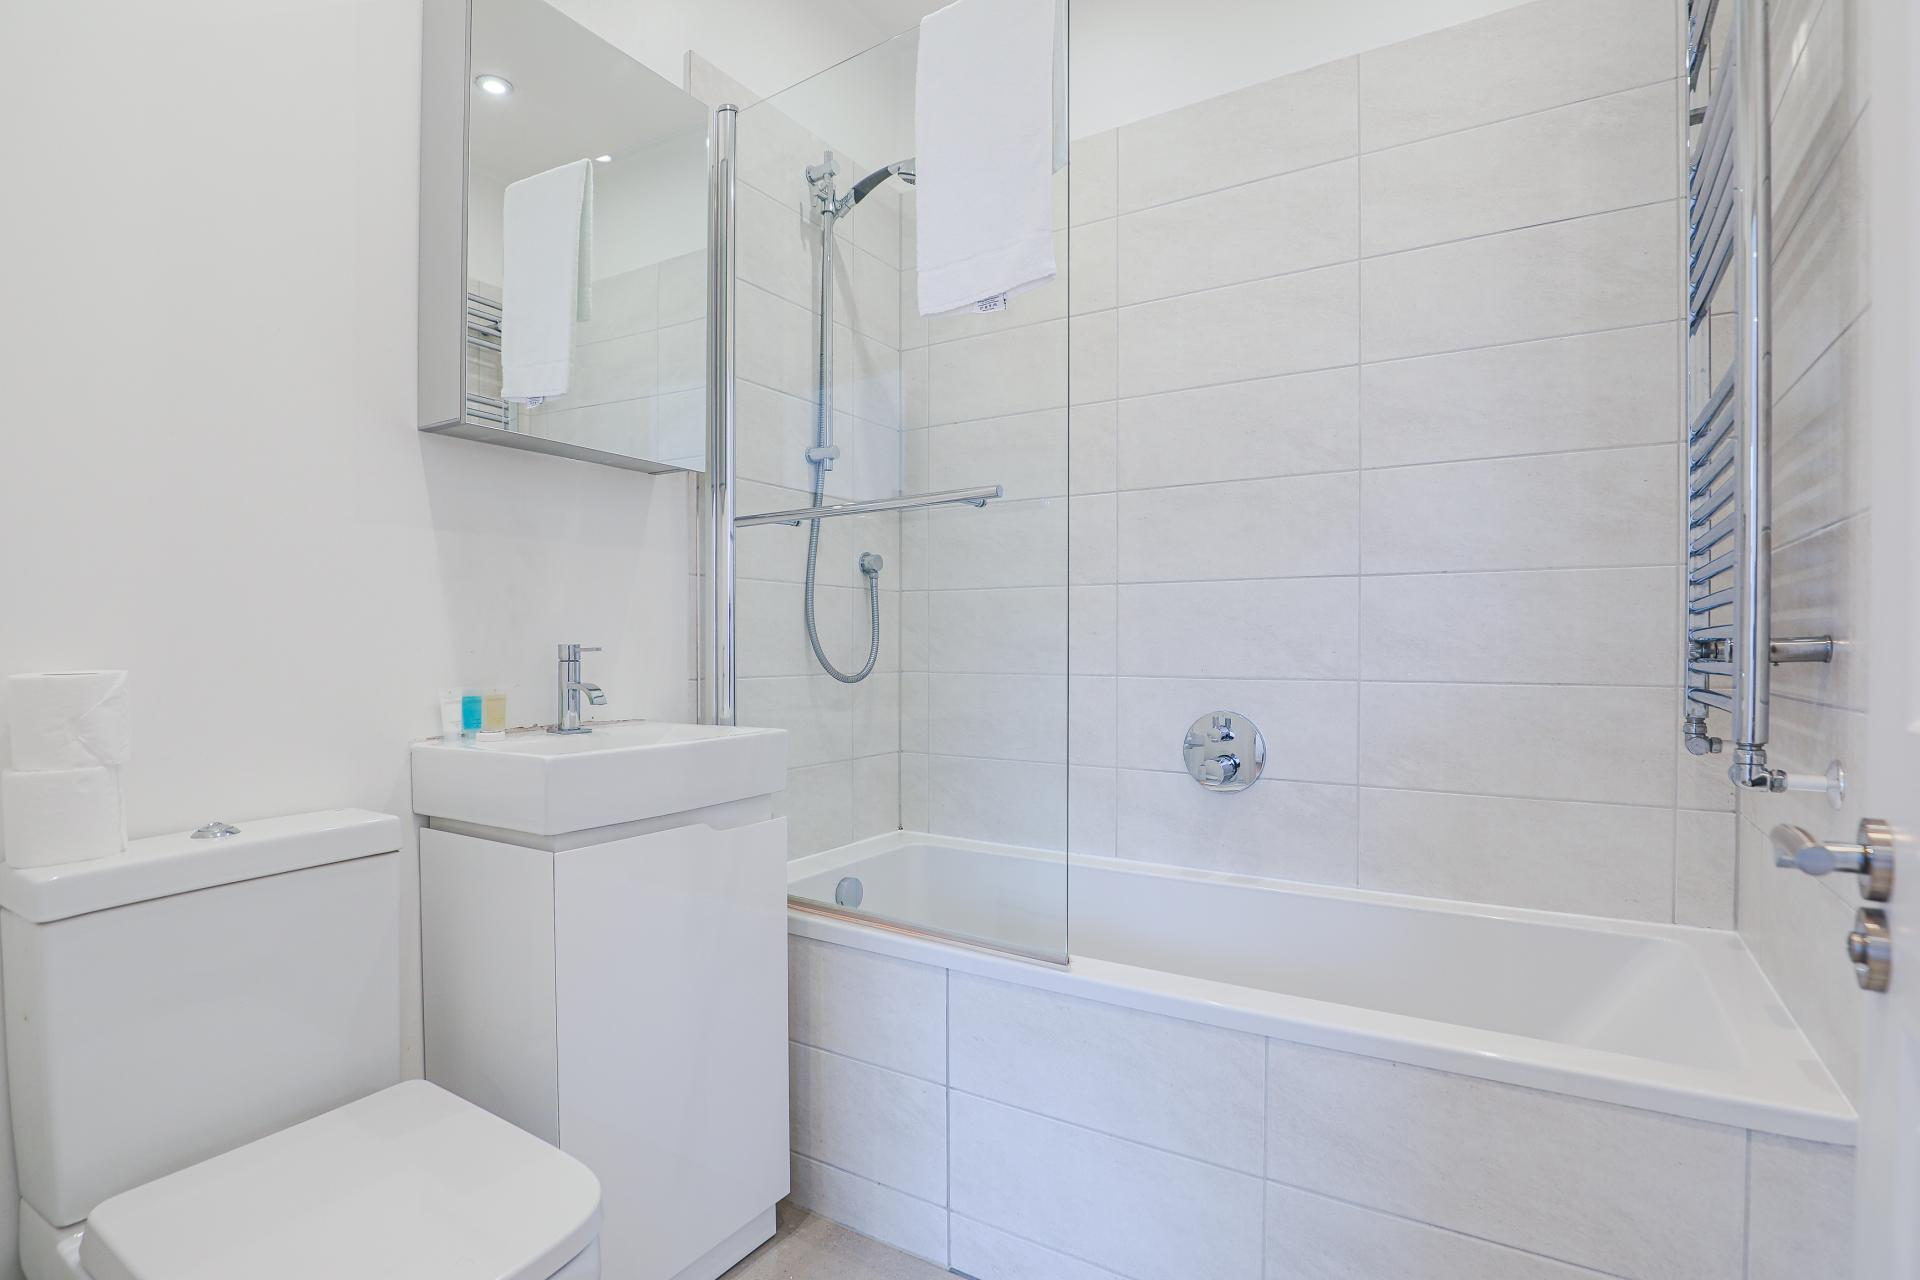 Toilet at Notting Hill Ladbroke Grove Apartments, Ladbroke Grove, London - Citybase Apartments